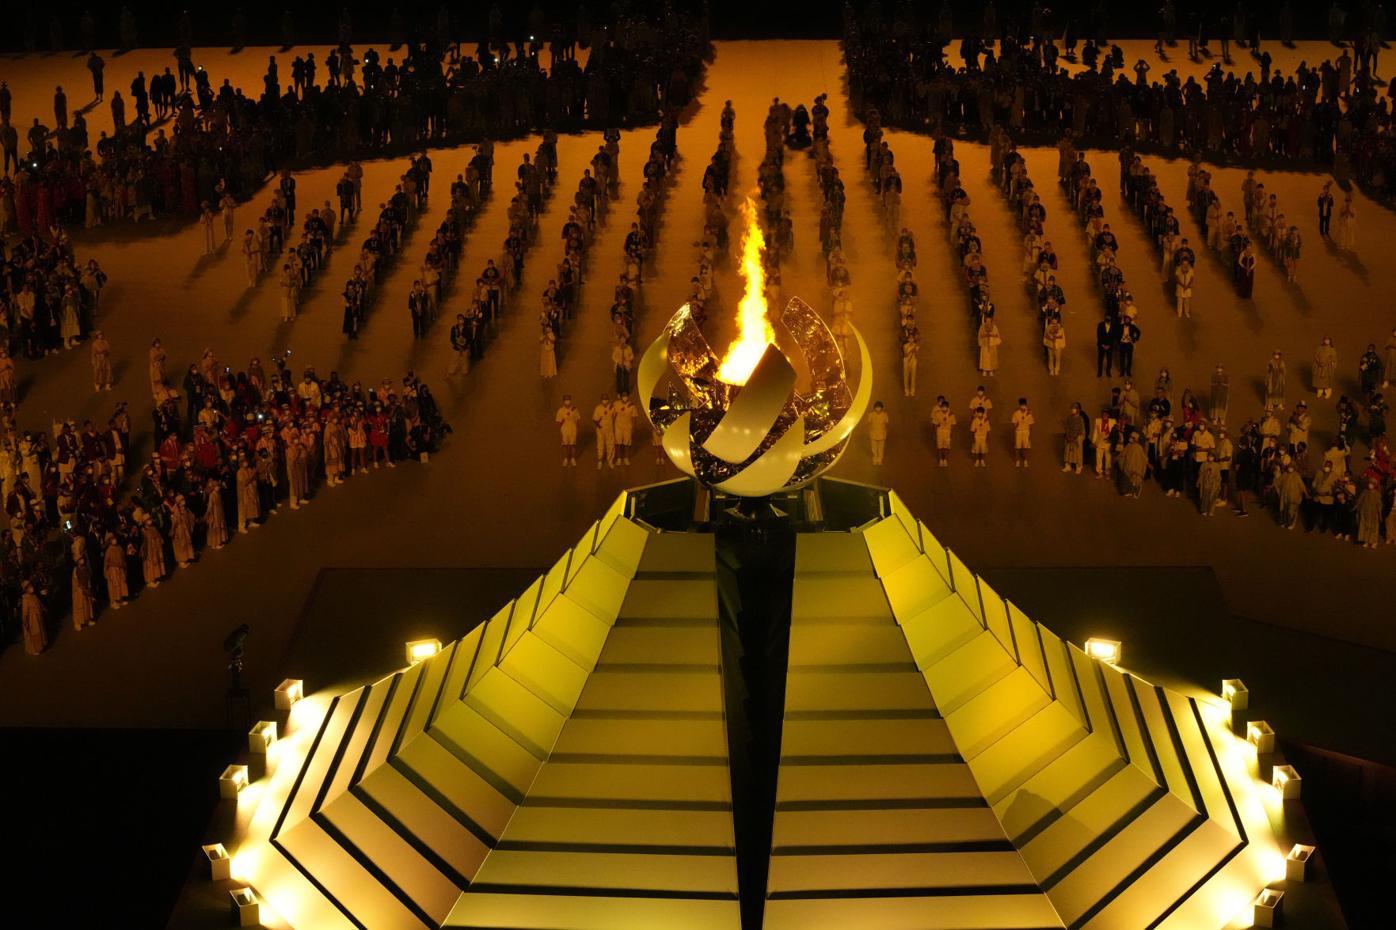 Tokyo Olympics Opening Ceremony Photo Gallery